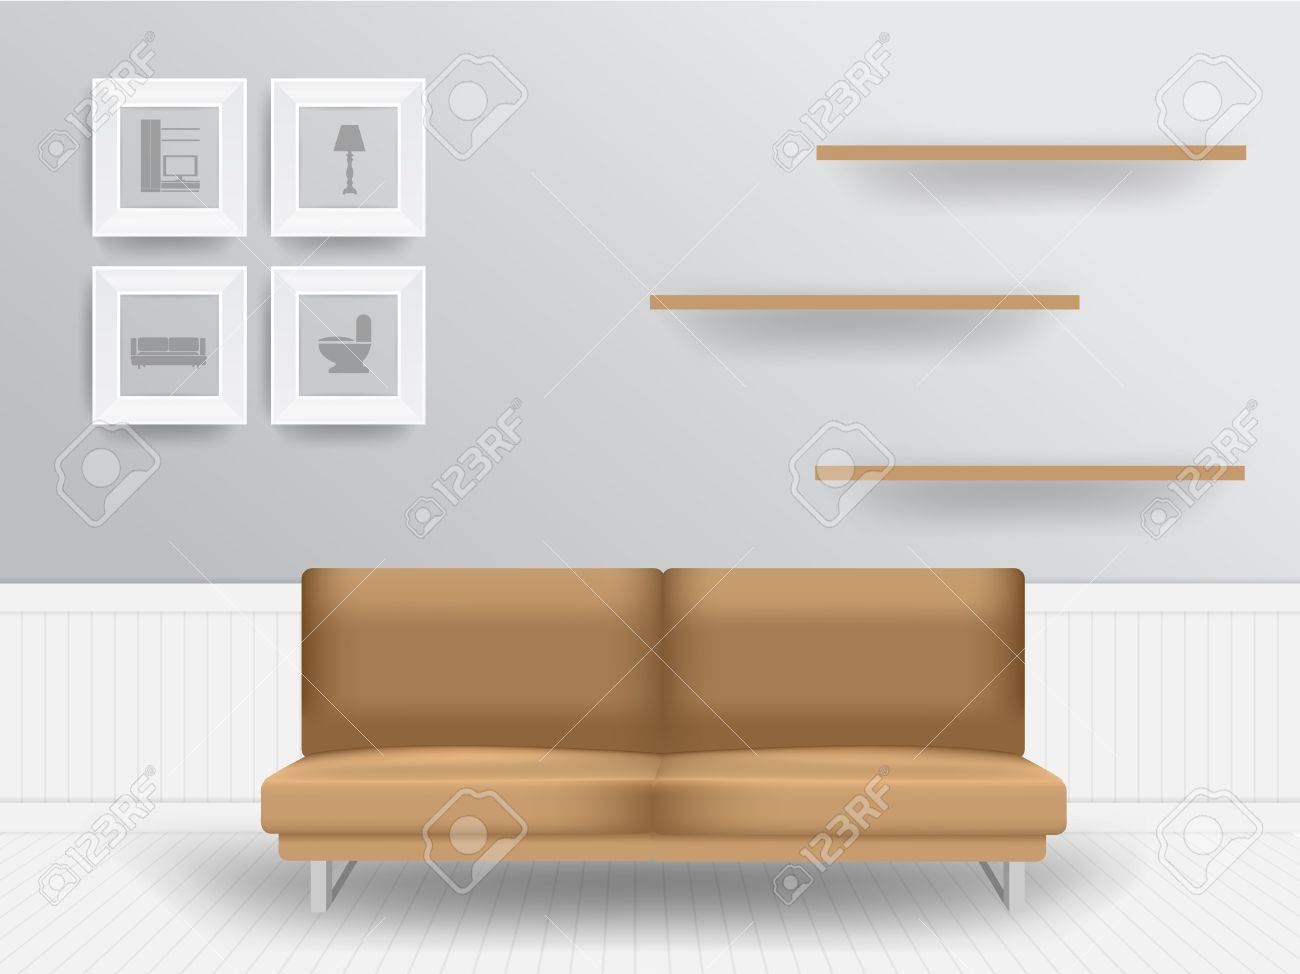 Living Room Furniture Templates living room interior concept, vector illustration modern template